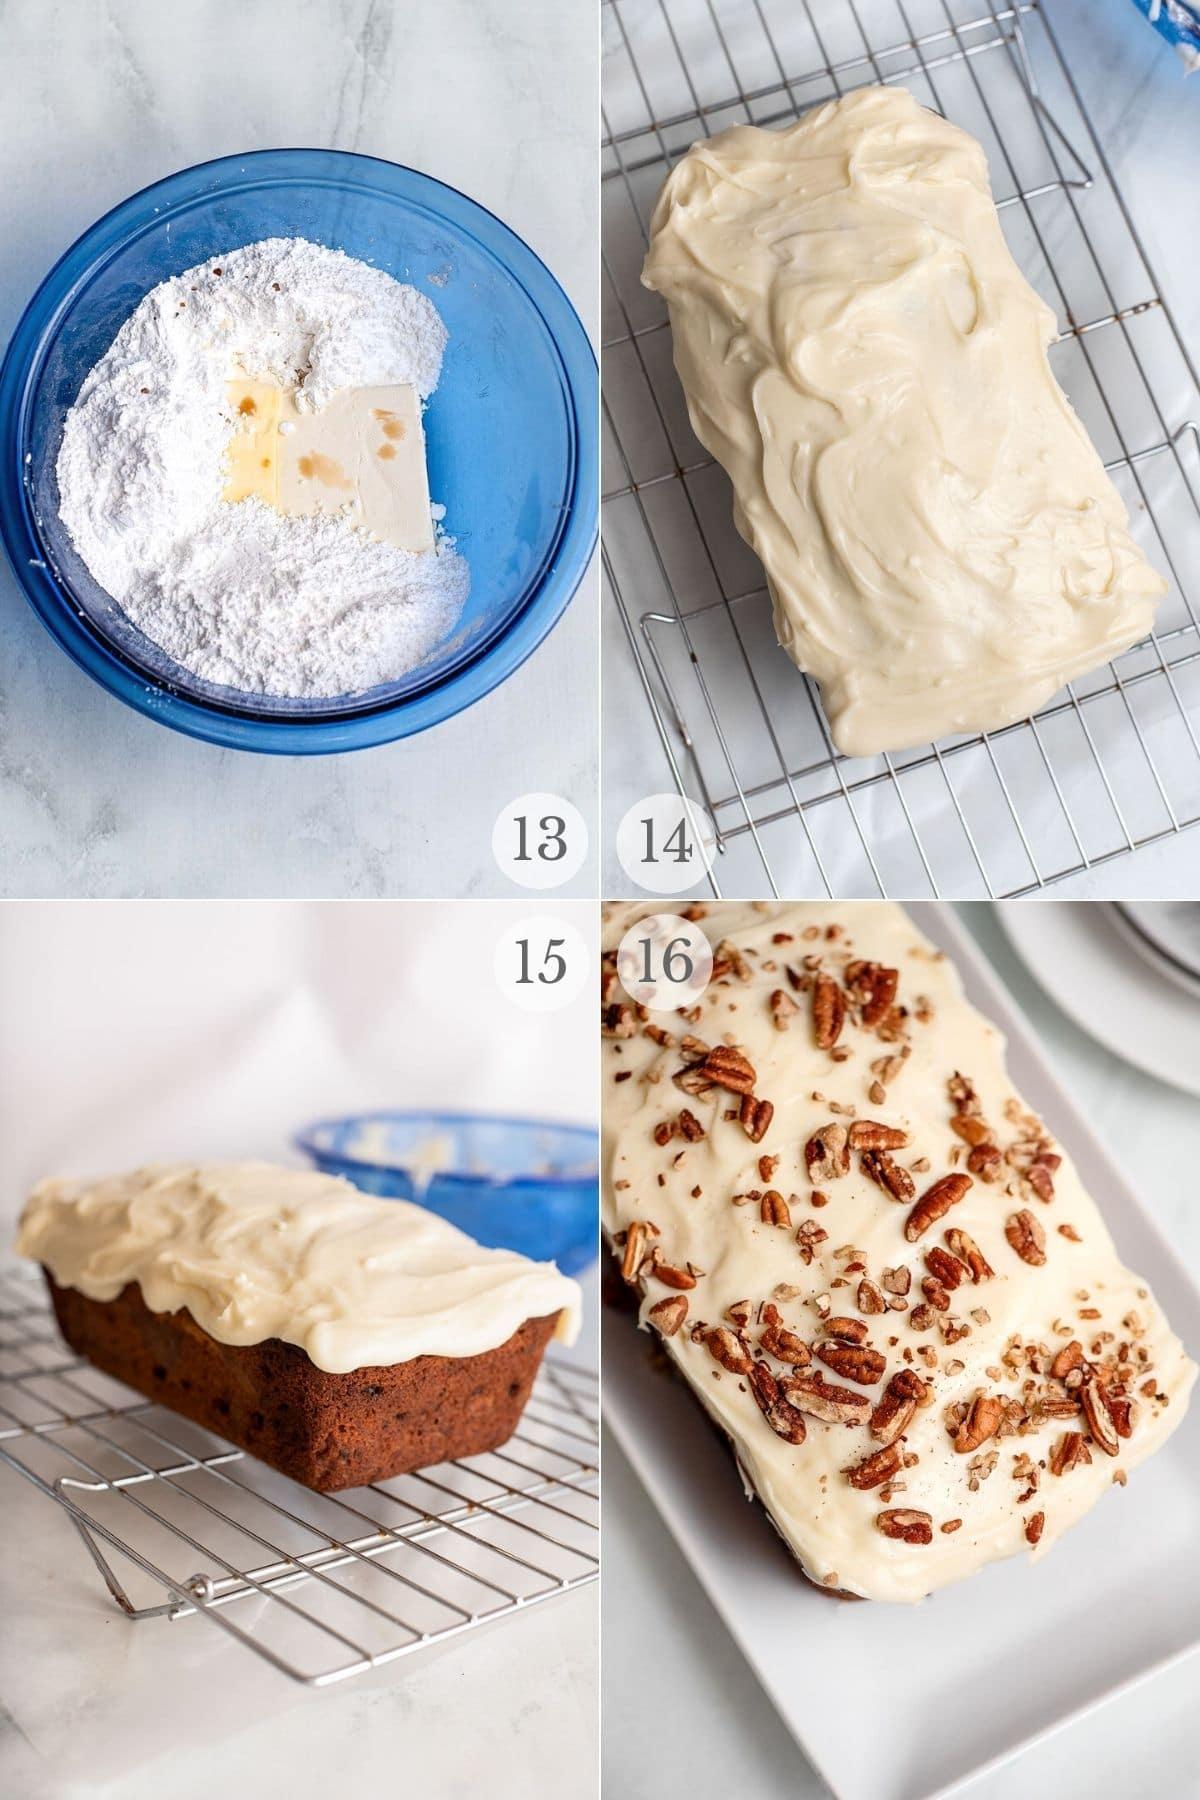 carrot loaf cake recipe steps 13-16